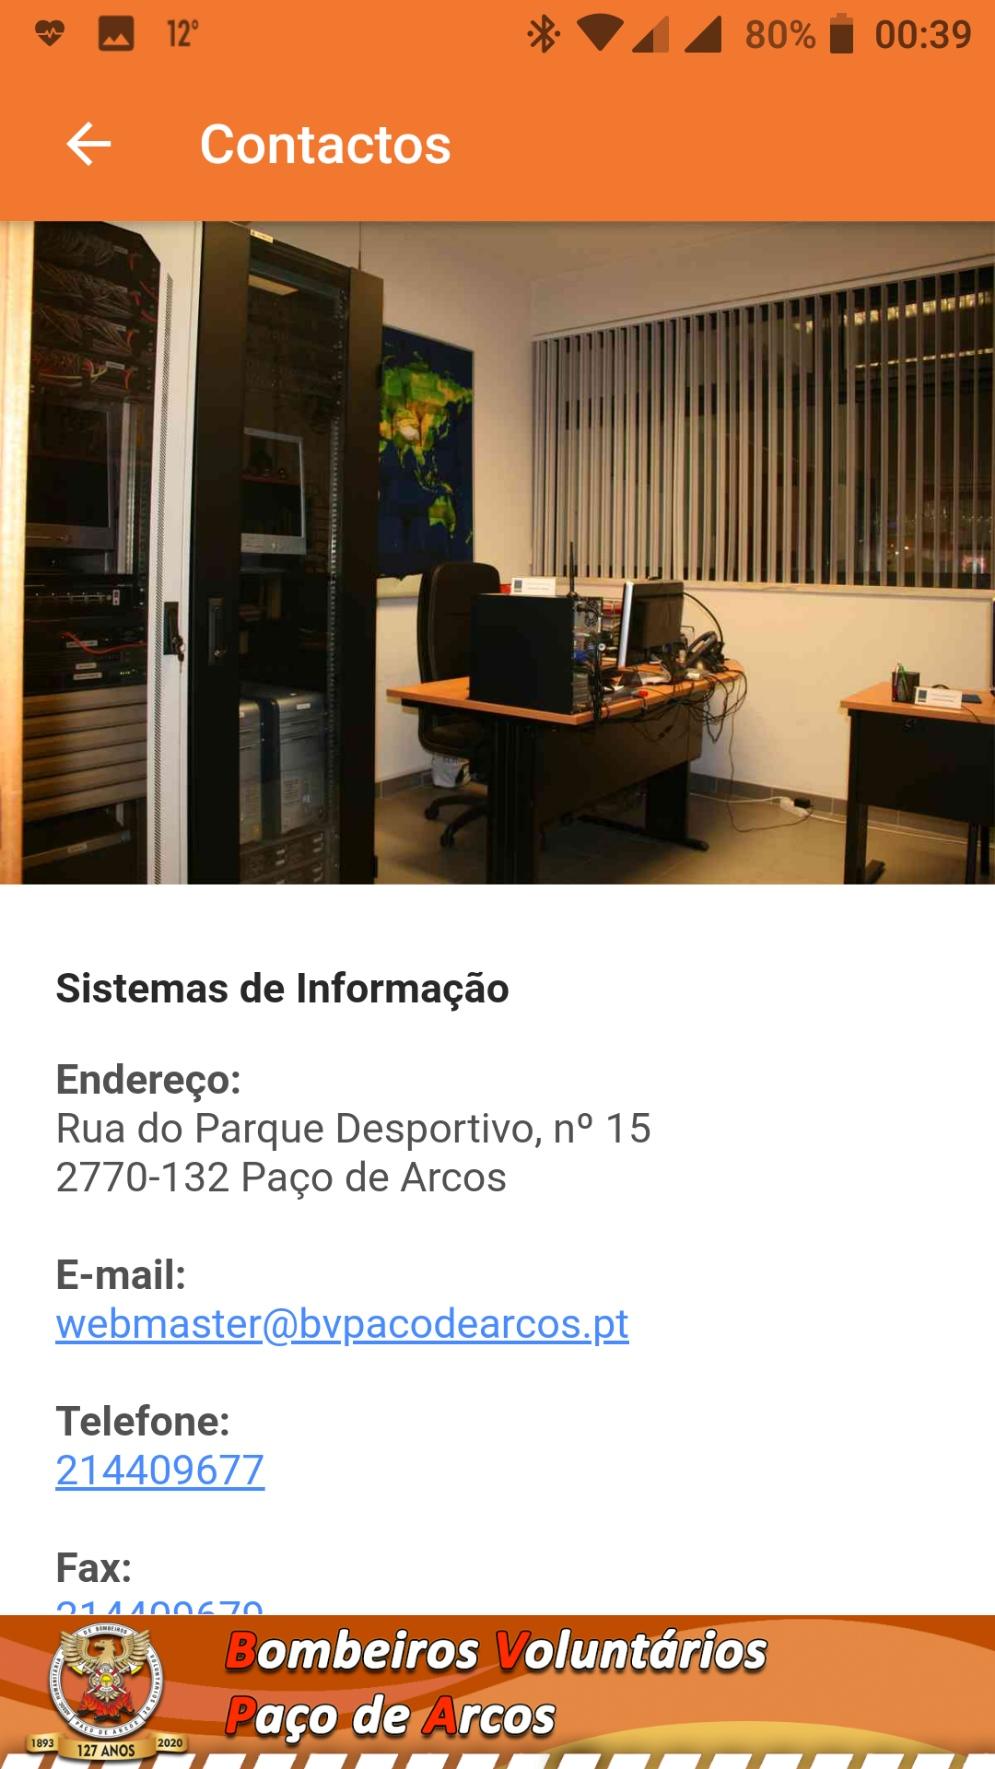 app_bvpacodearcos_20201030 (23)